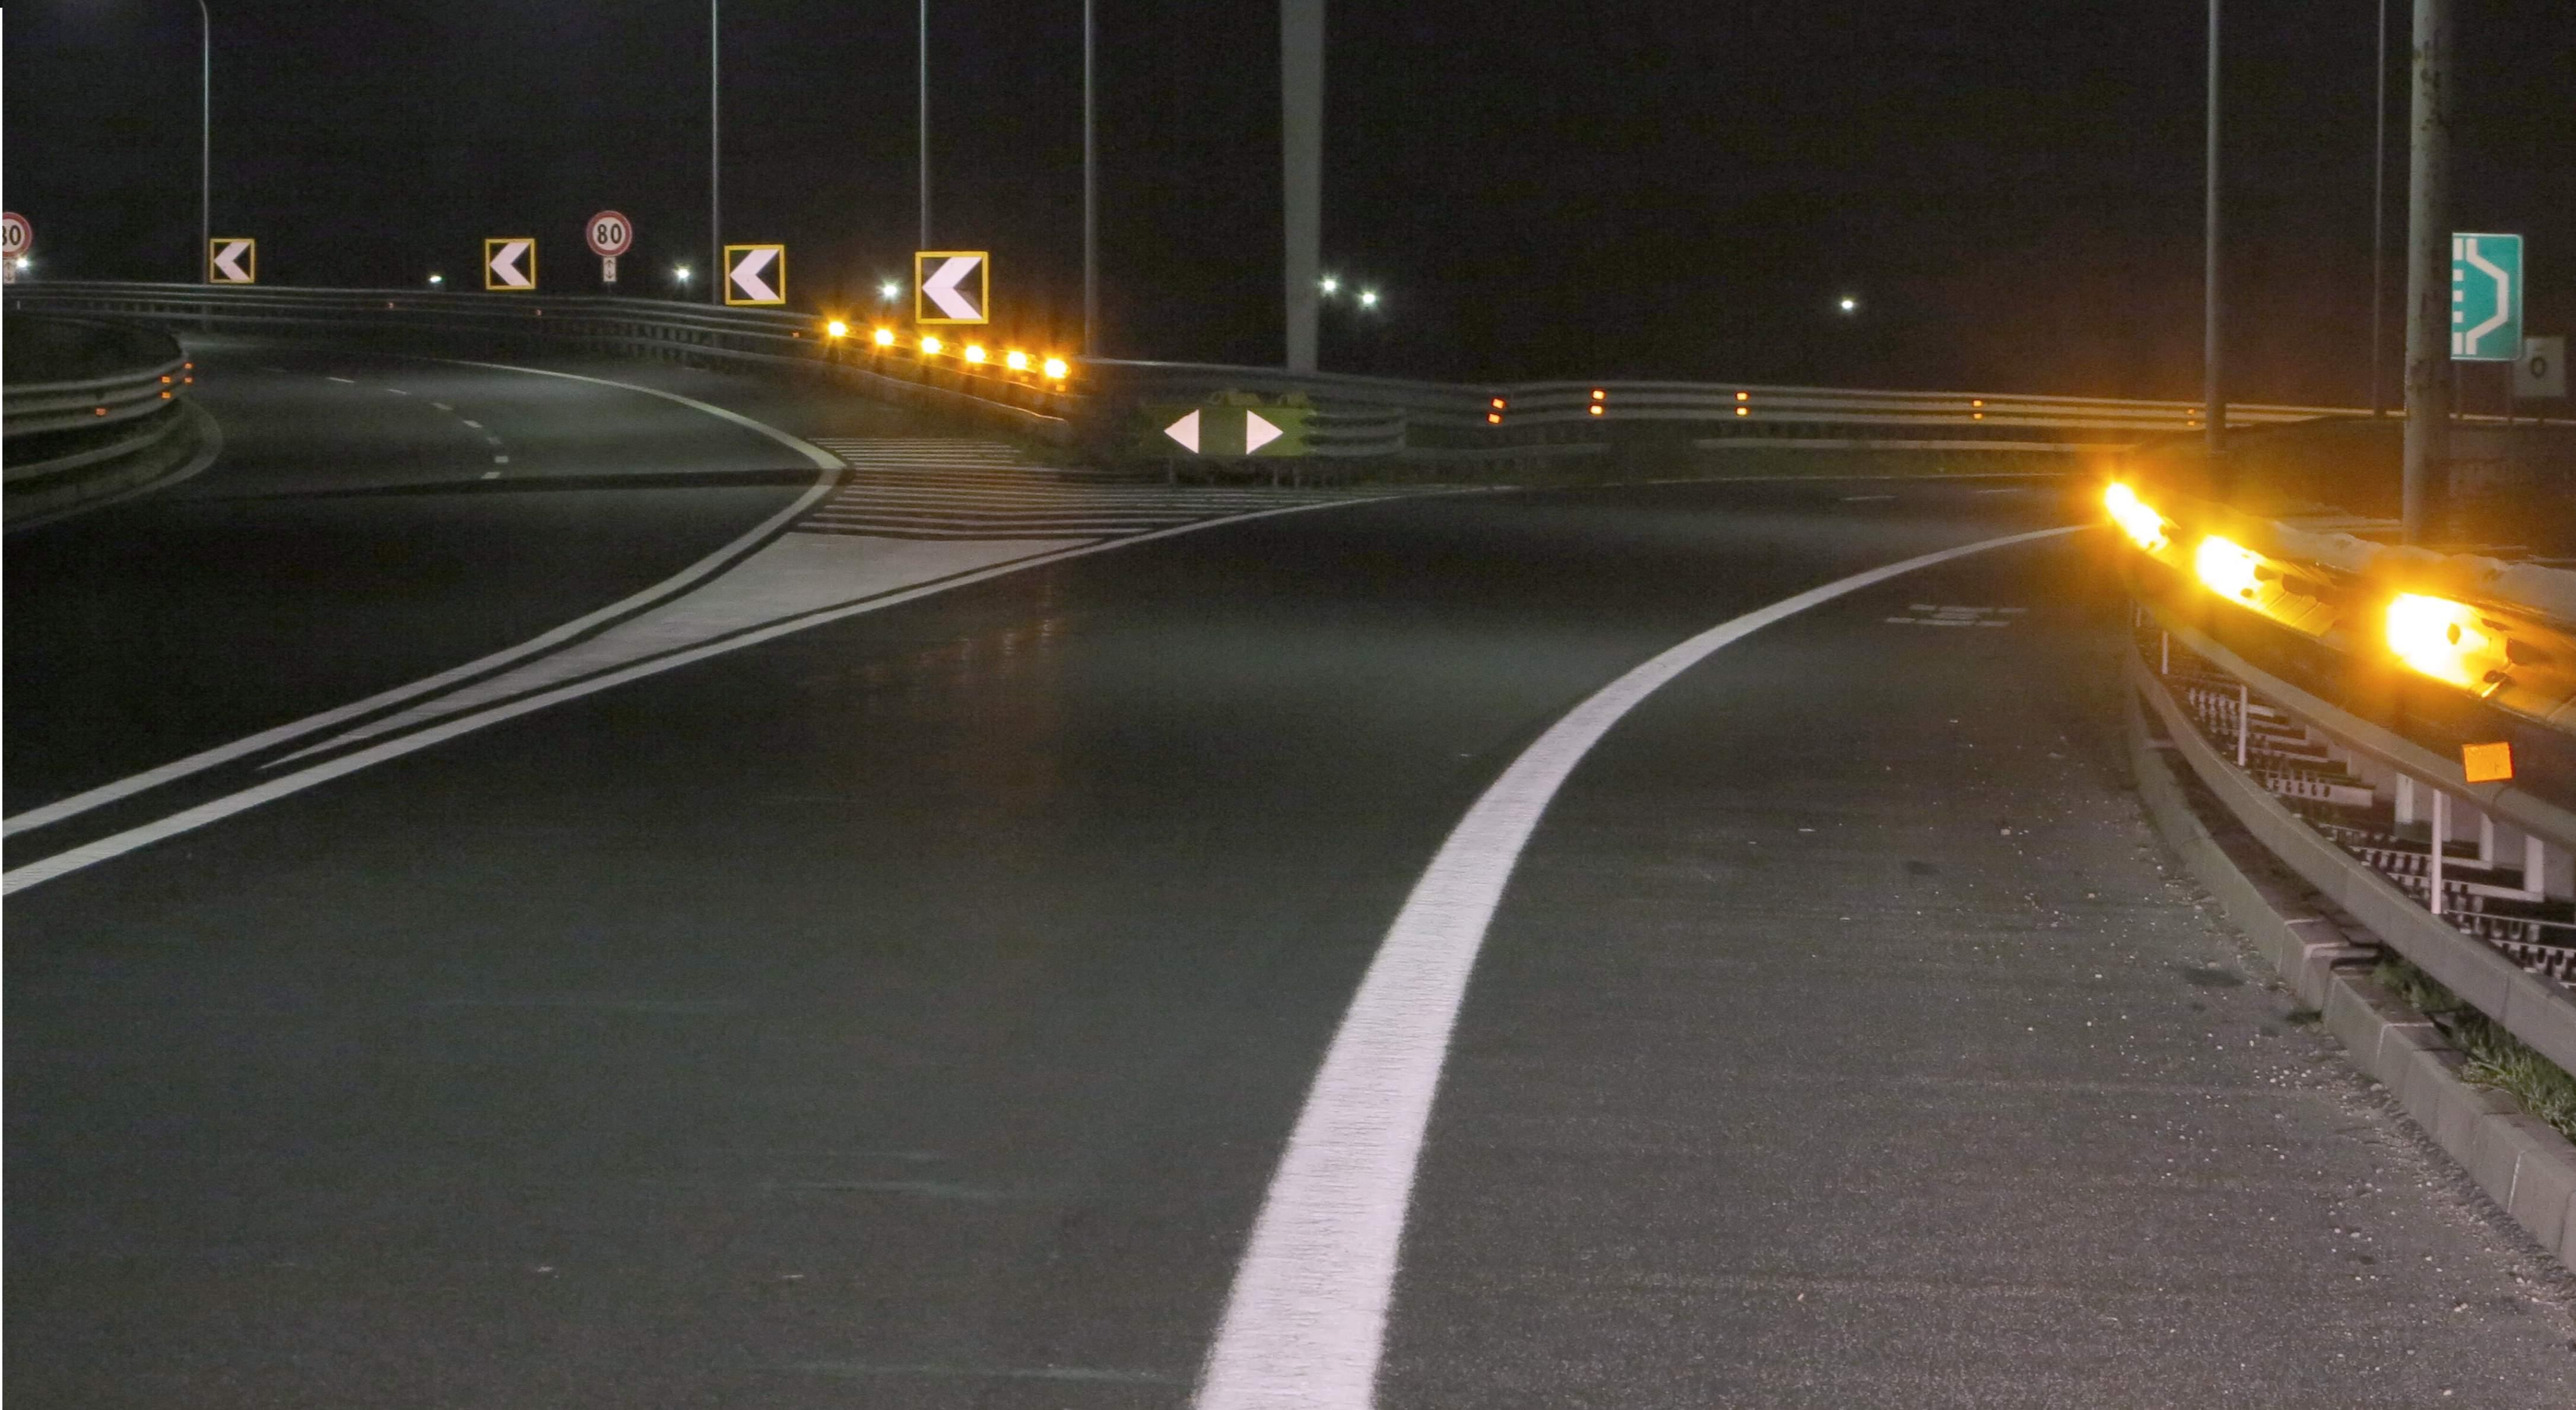 Trafficom Technologies Sp Z Oo